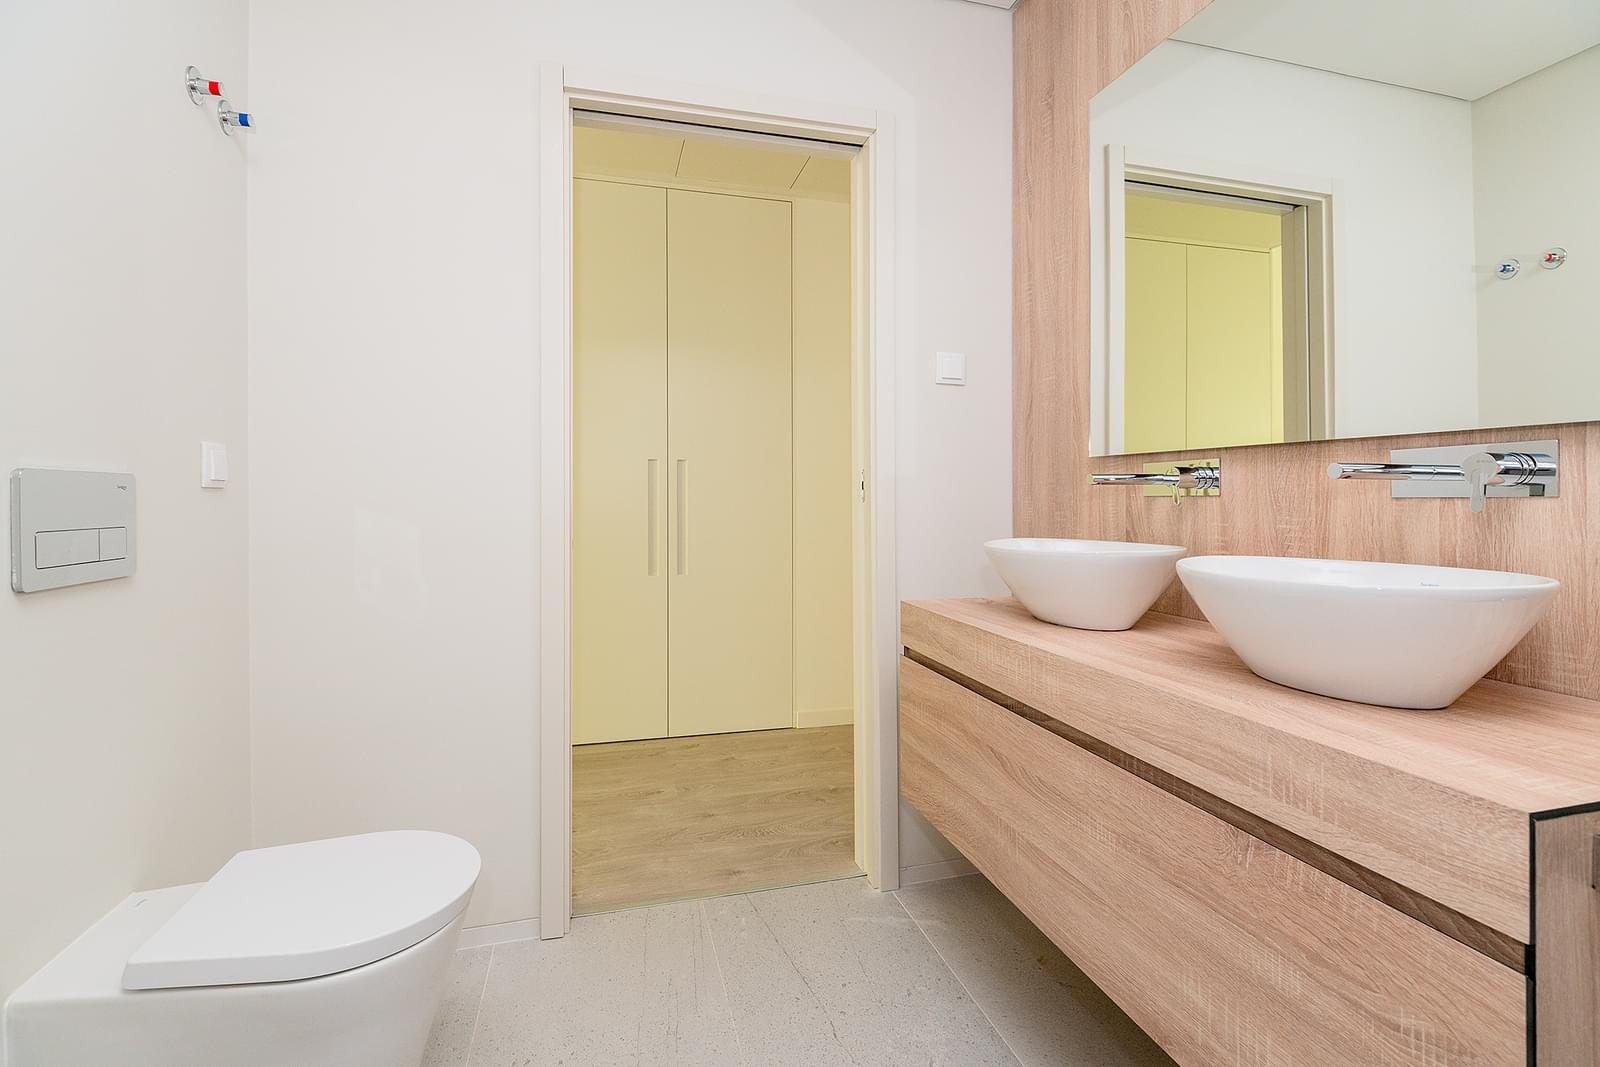 pf18308-apartamento-t2-lisboa-4c67f4ad-0f06-420c-8612-b4f38da38fa0